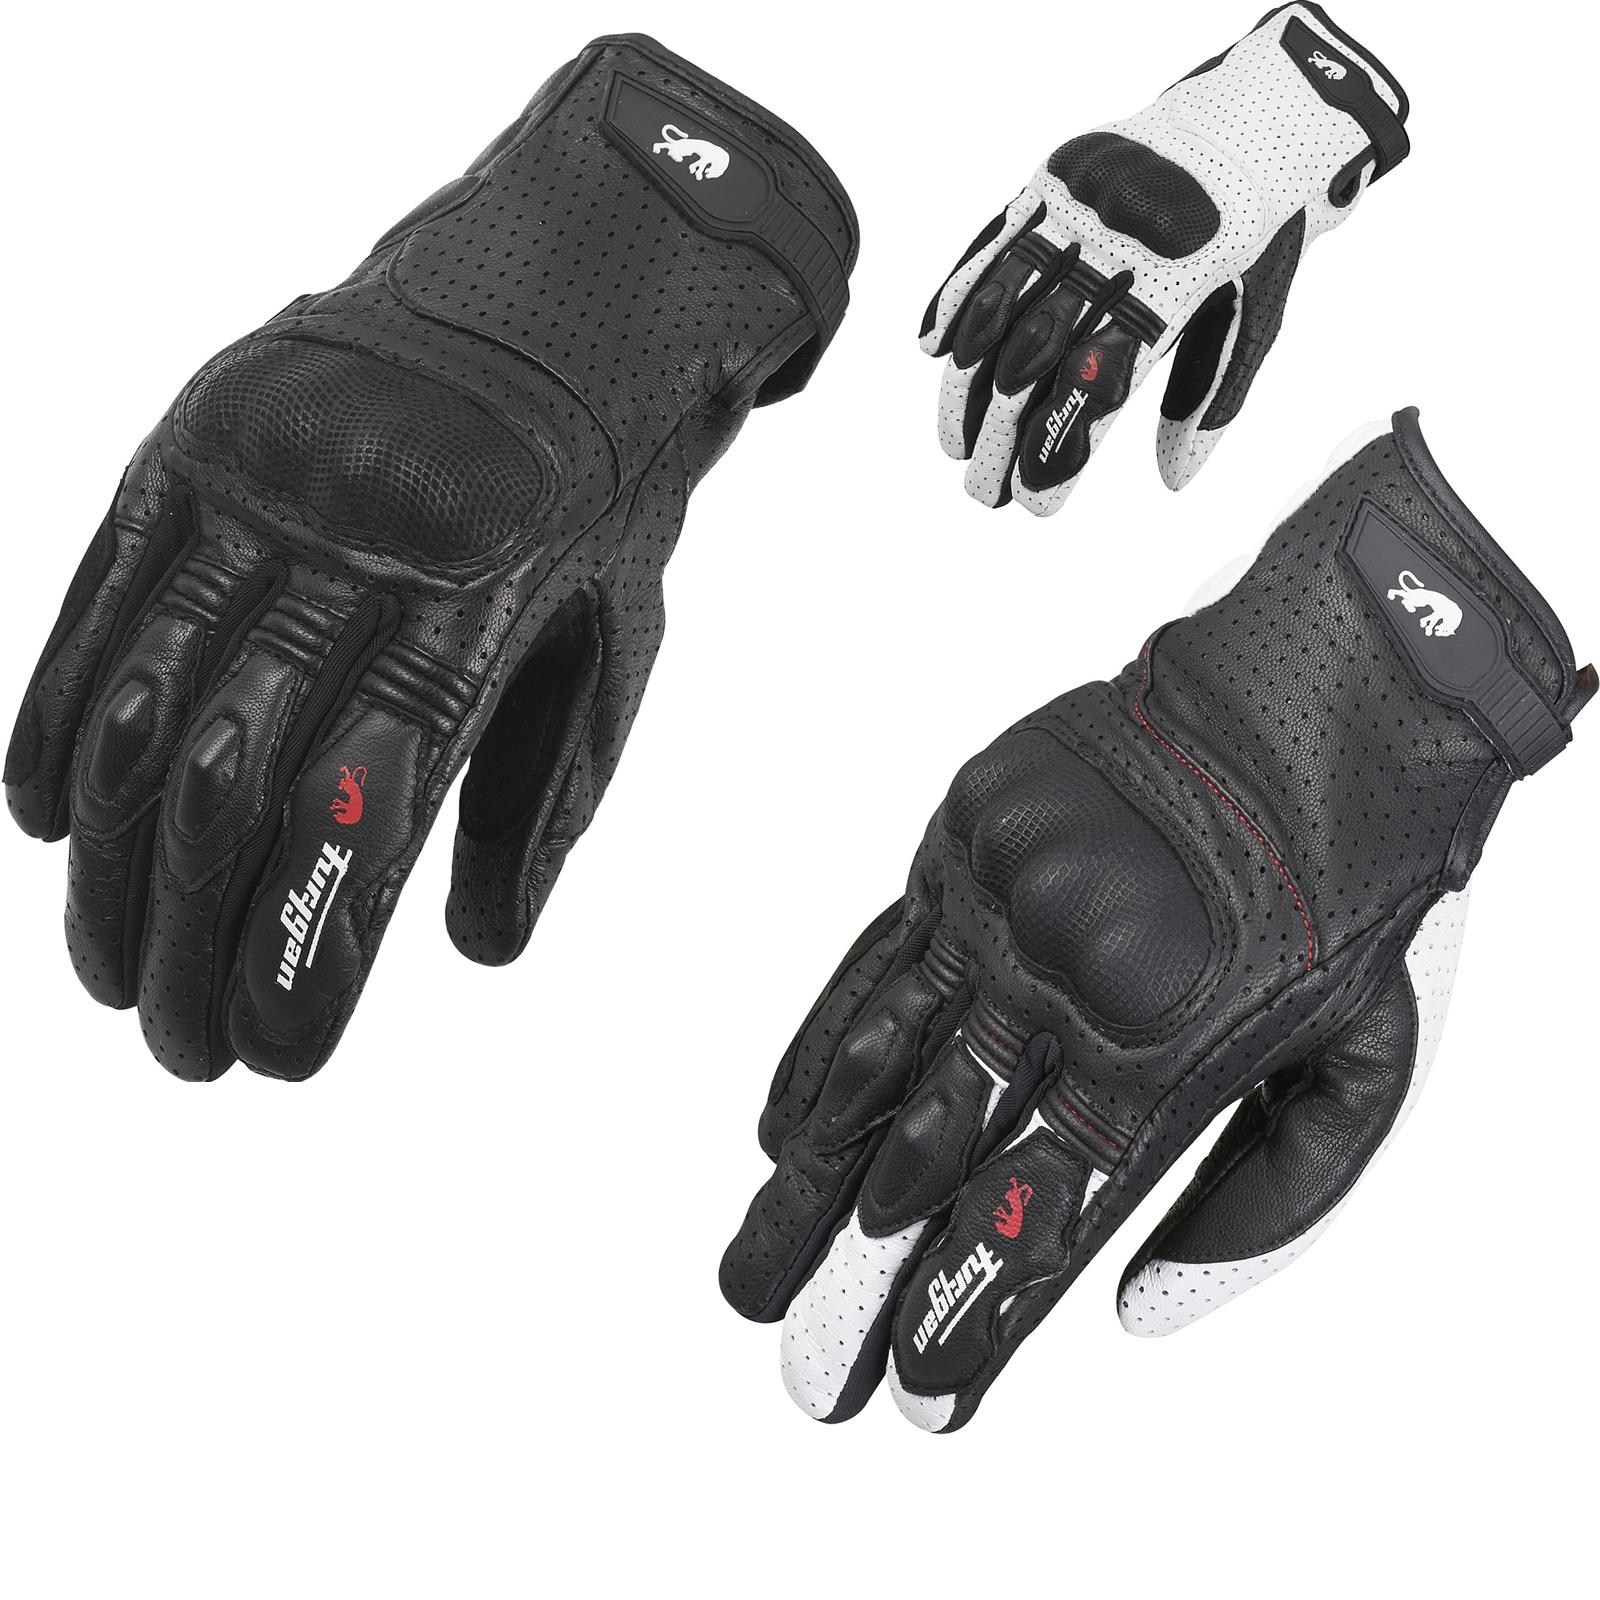 Sport Motorcycle Gloves: Furygan TD21 Sport Leather Motorcycle Gloves